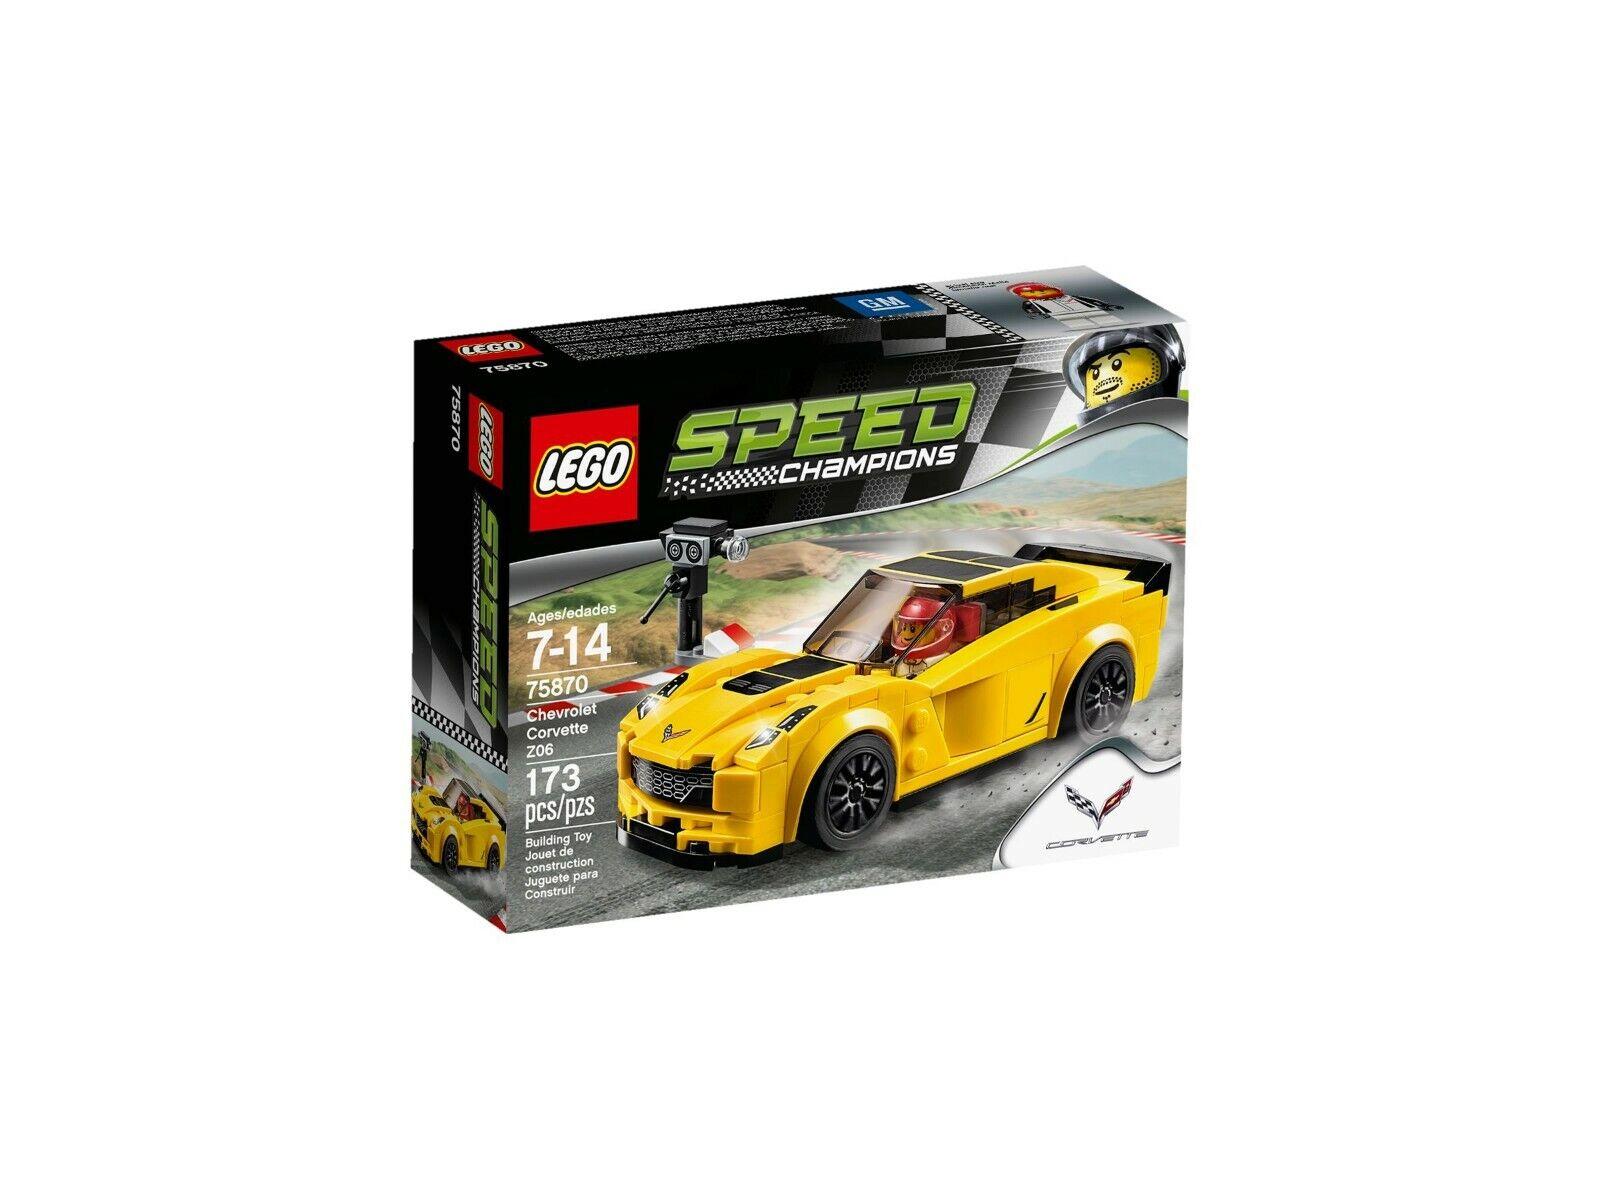 Lego Speed Campeones 75870 Chevrolet Corvette Z06 - Nuevo Emb.orig